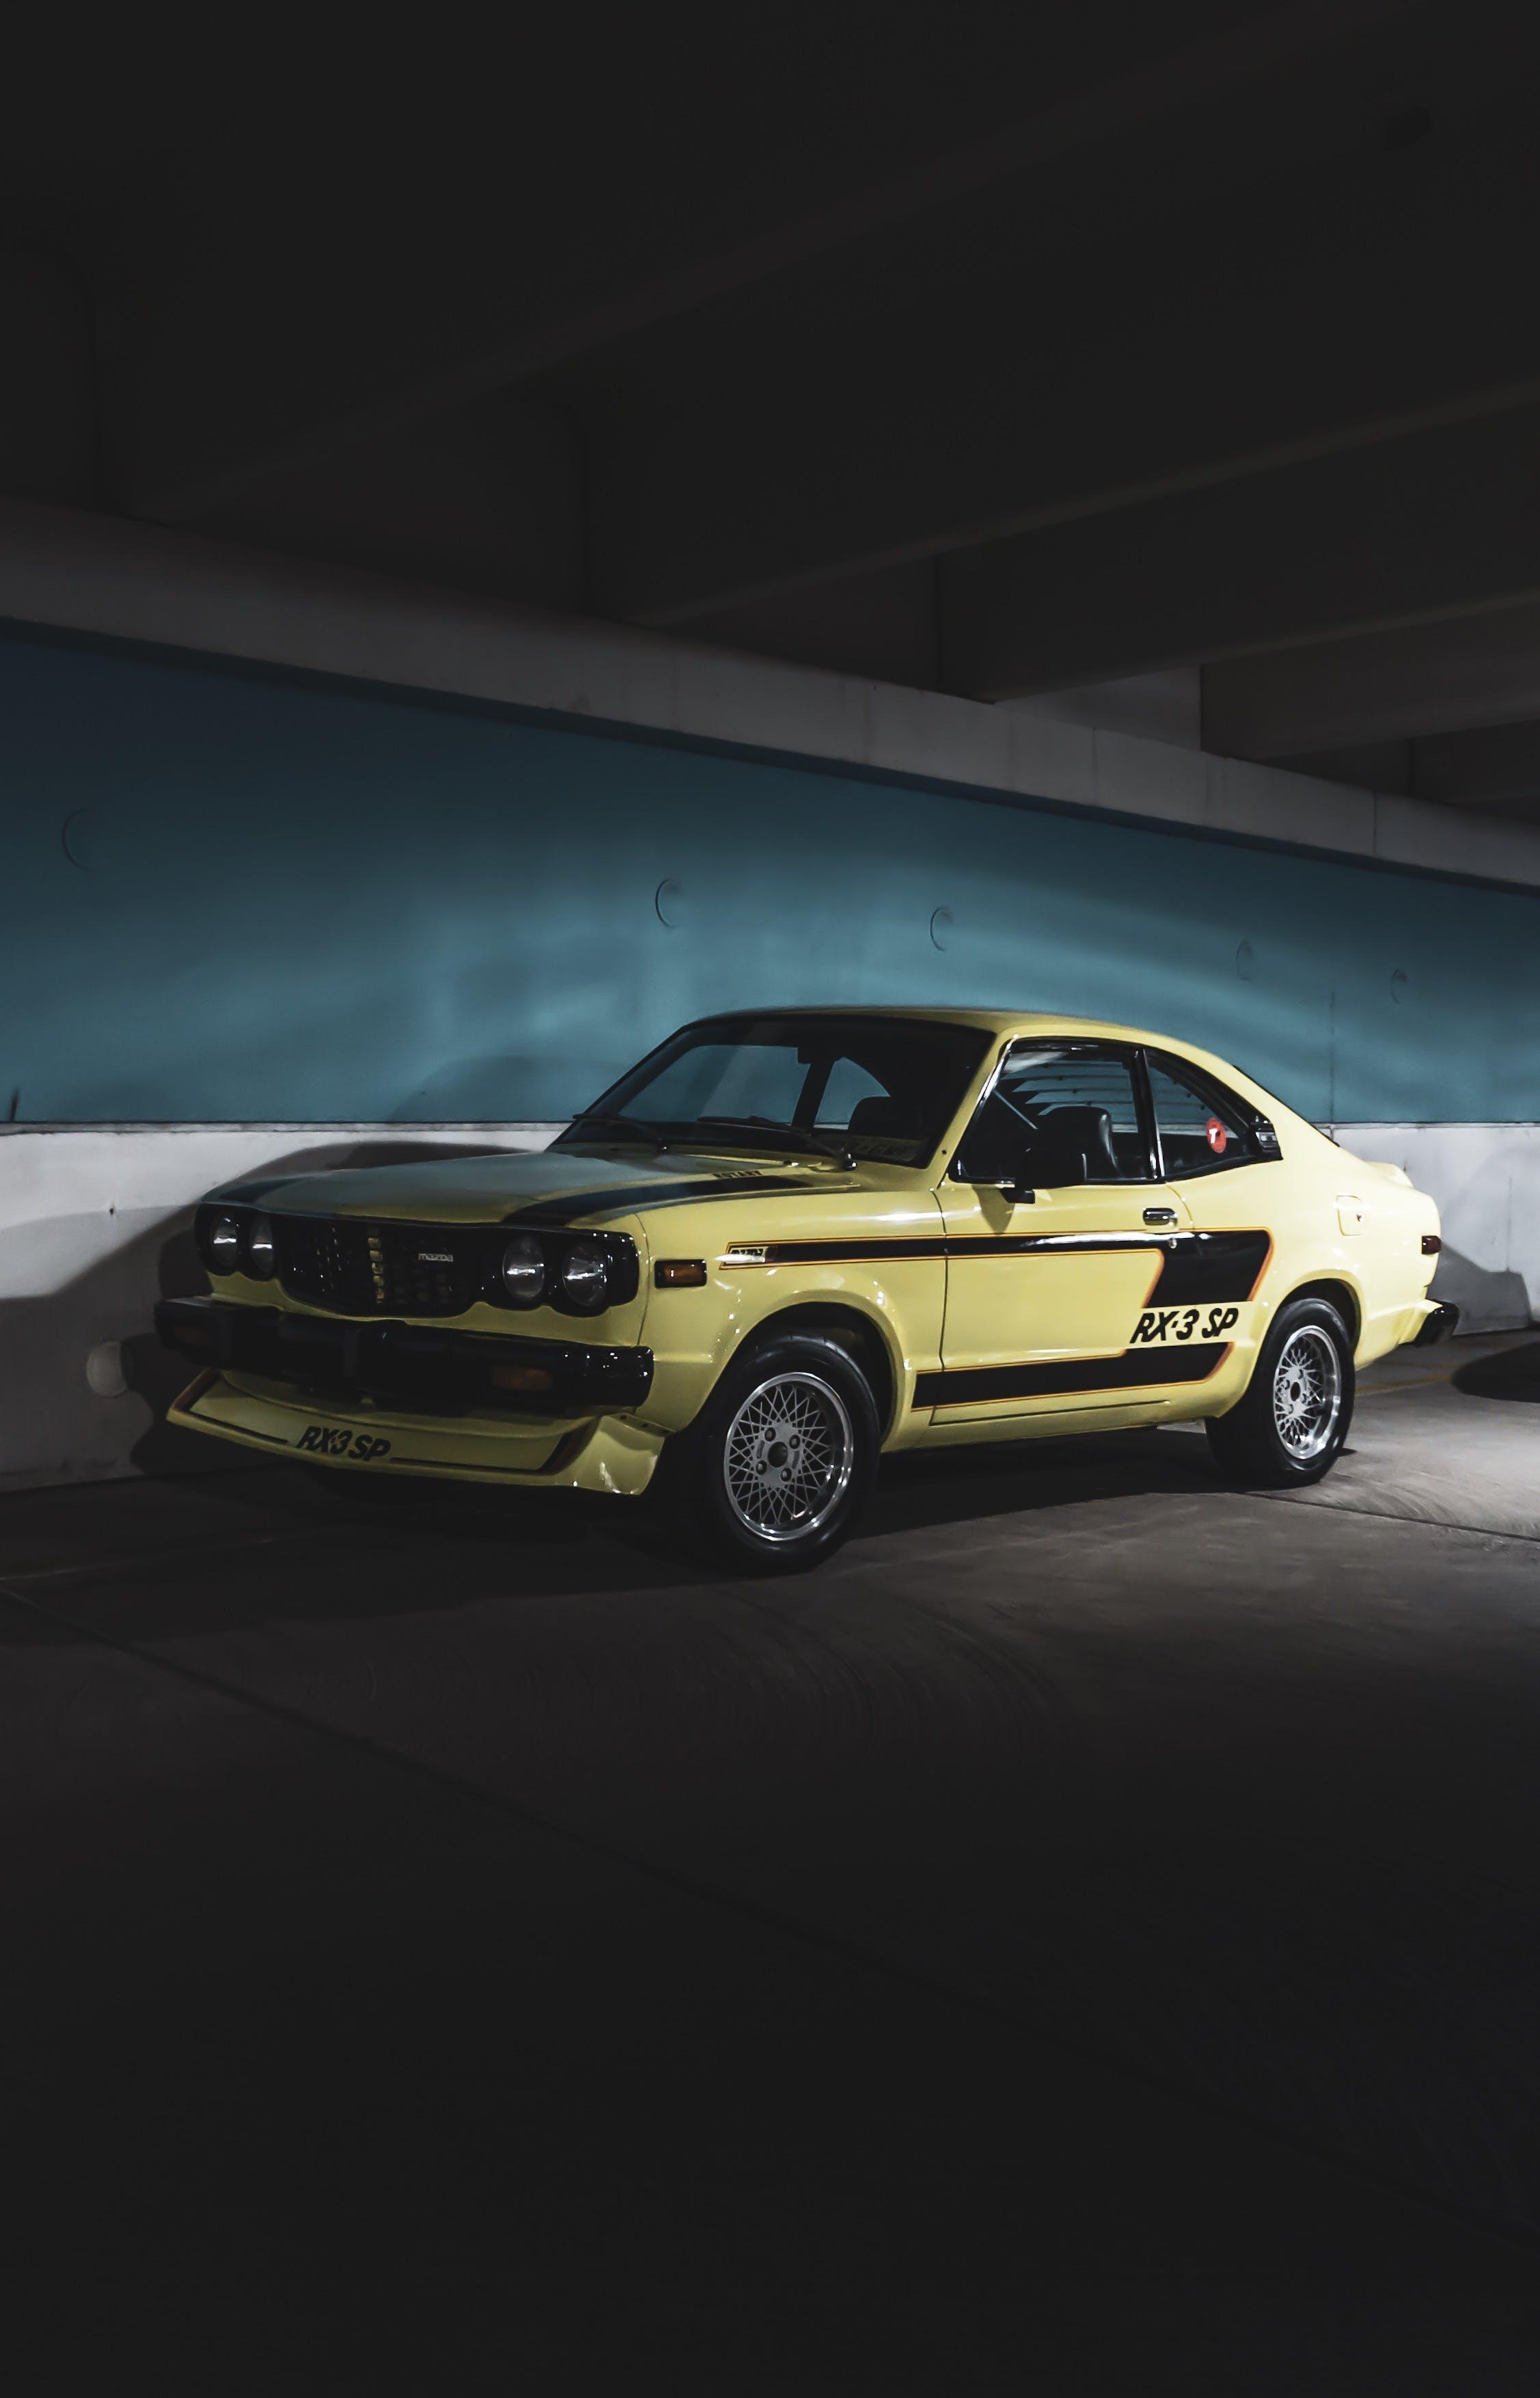 Gratis arkivbilde med bil, coupé, fortau, gul